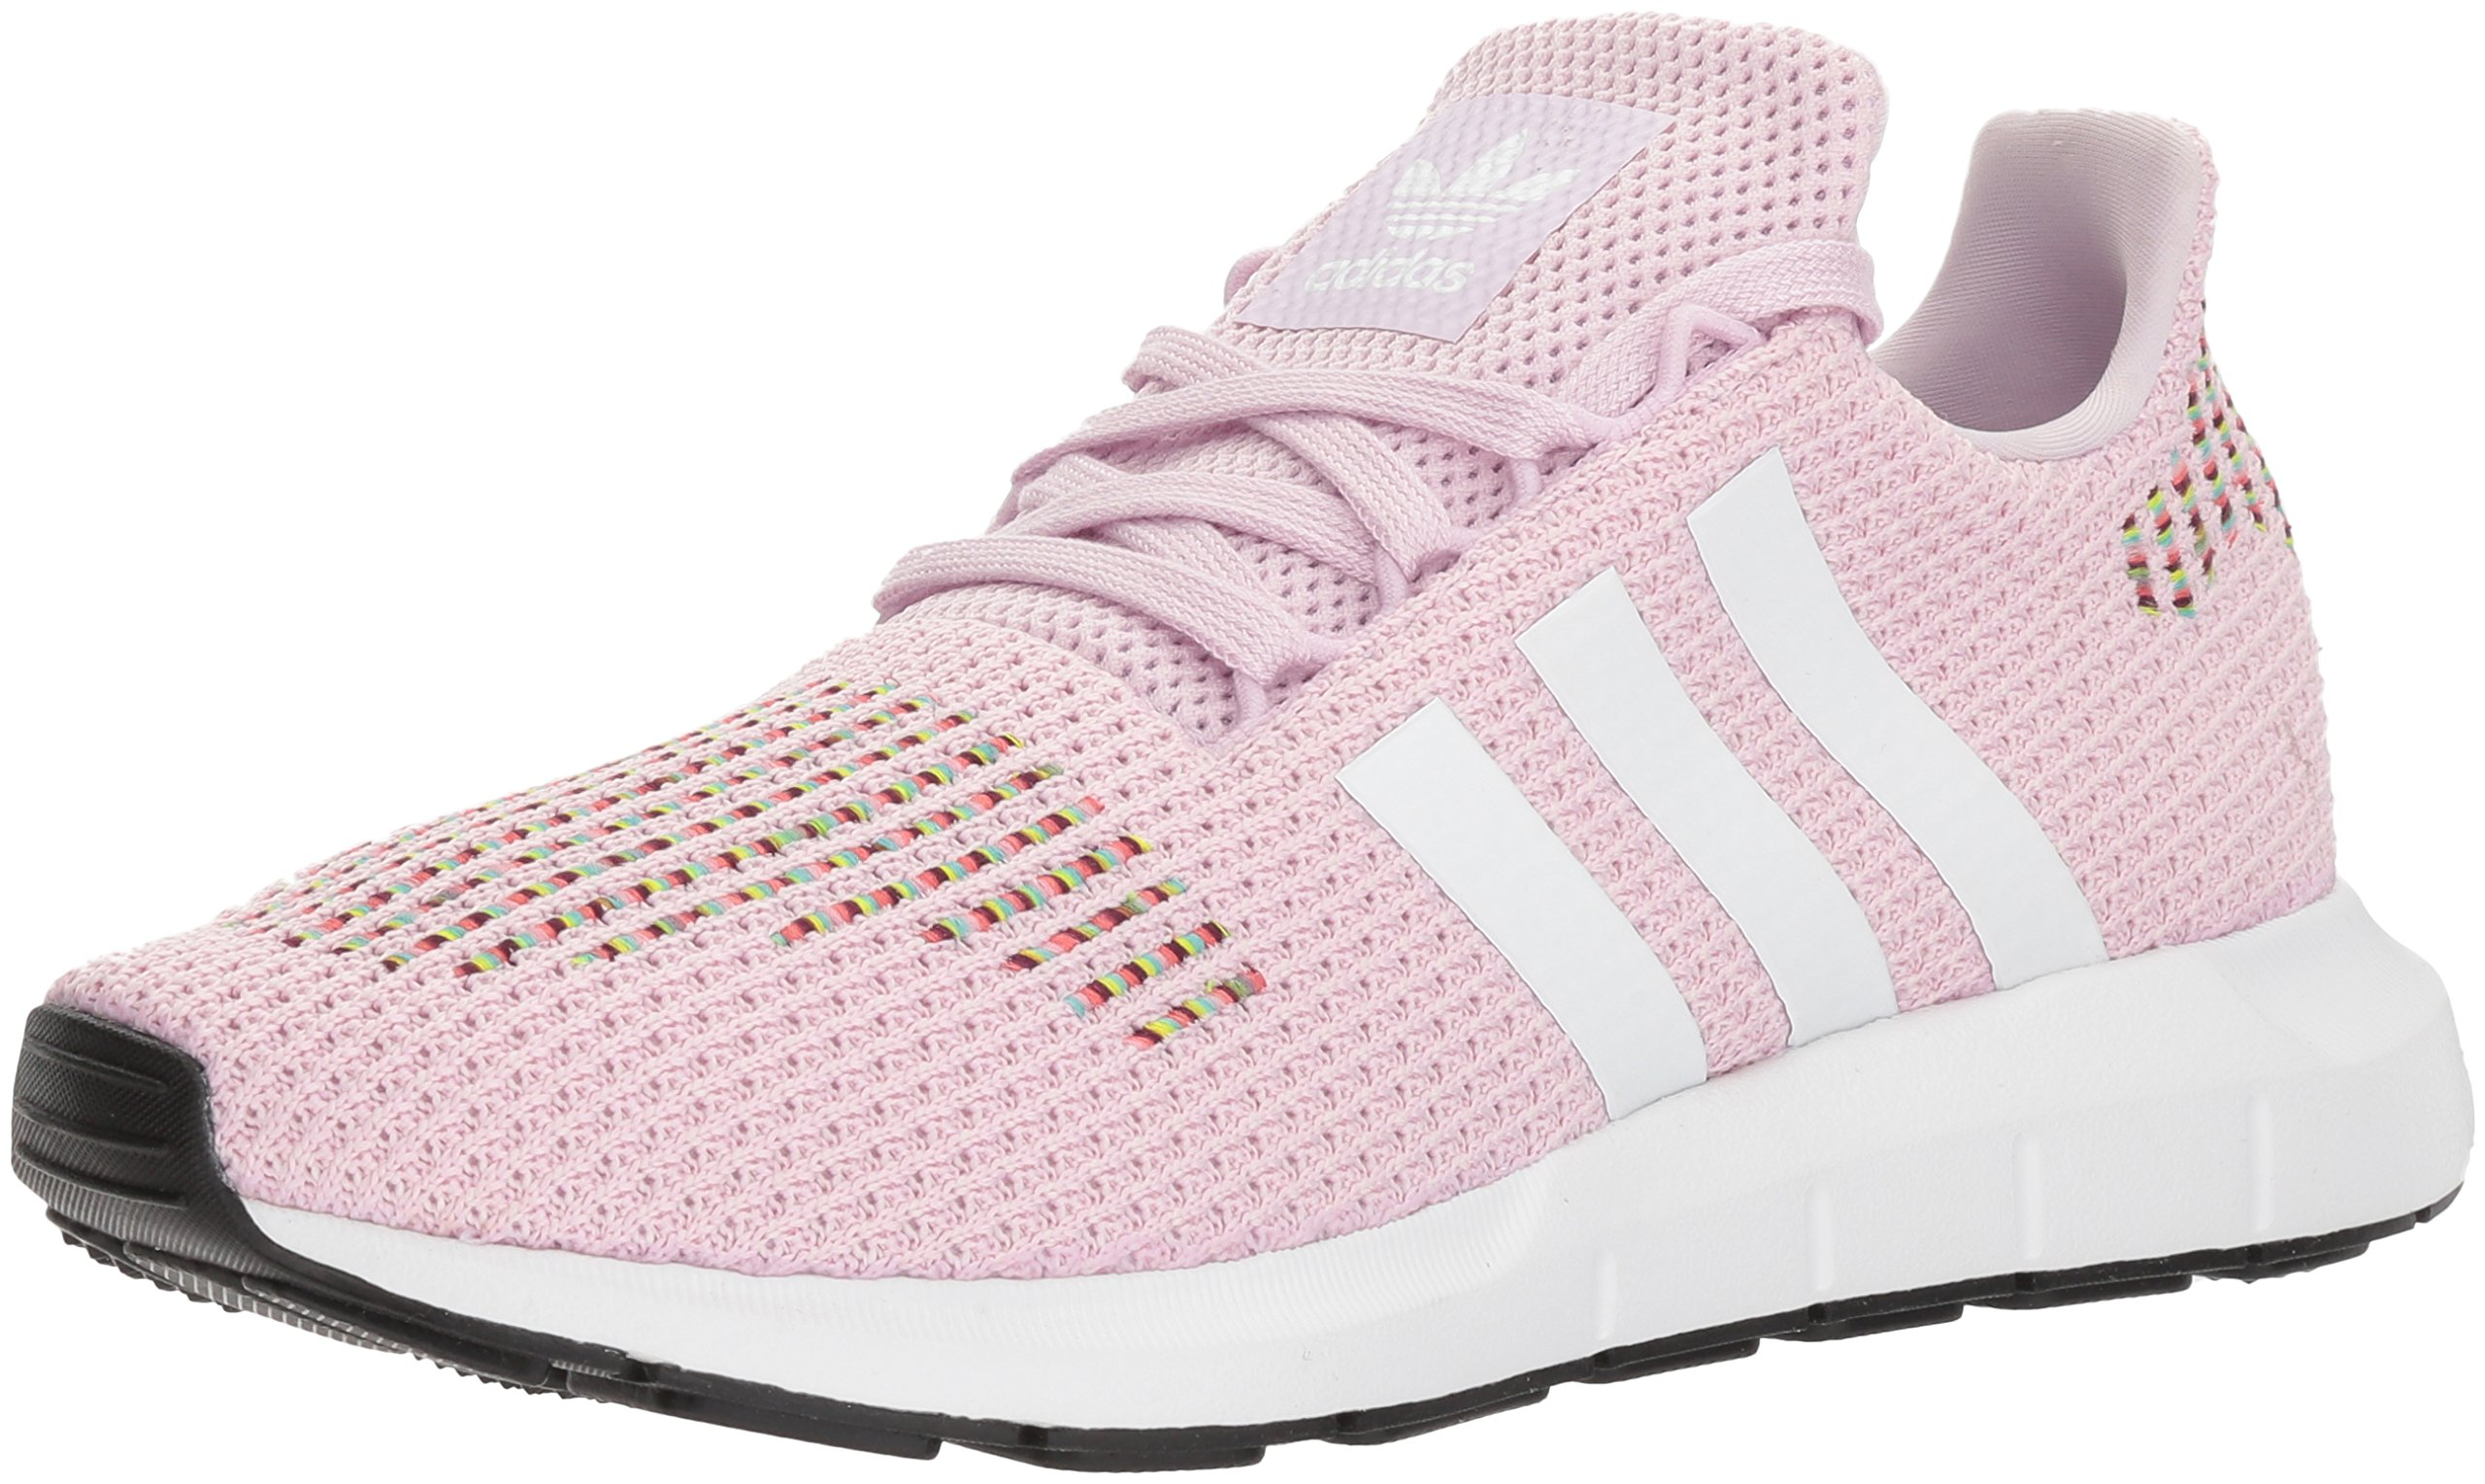 adidas Originals Women's Swift W Running-Shoes,aero Pink/White/core Black,9.5 M US